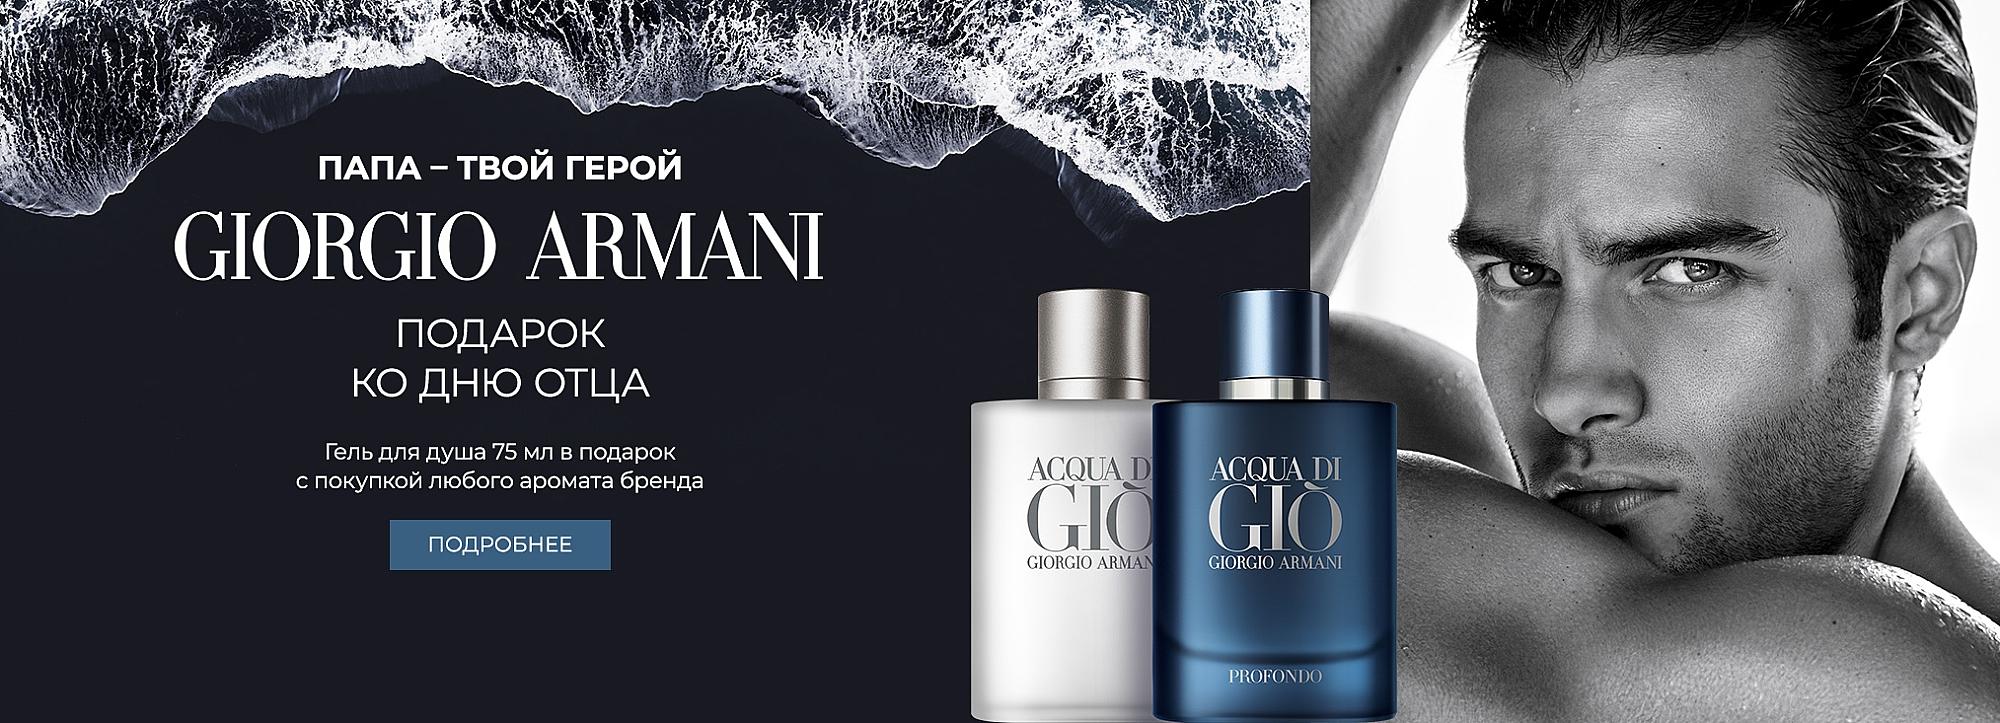 Giorgio Armani_3218